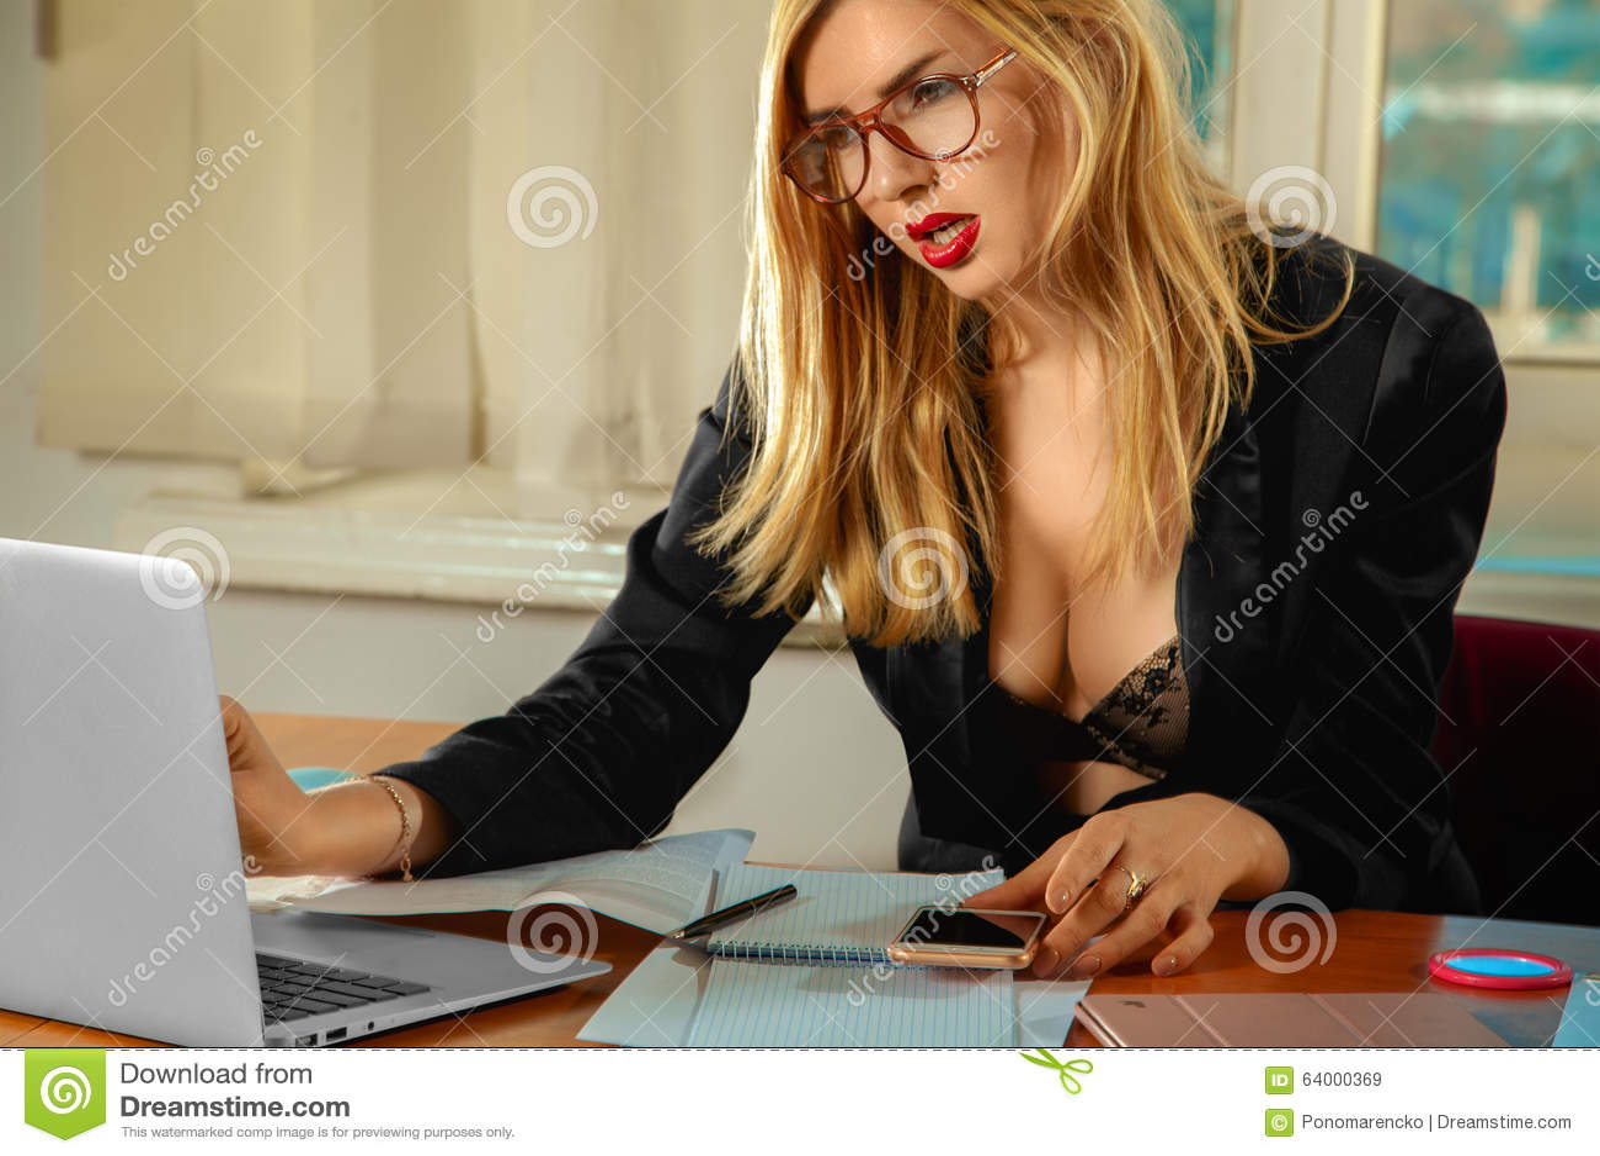 name hottie. Samantha mathis nude scene try best balance